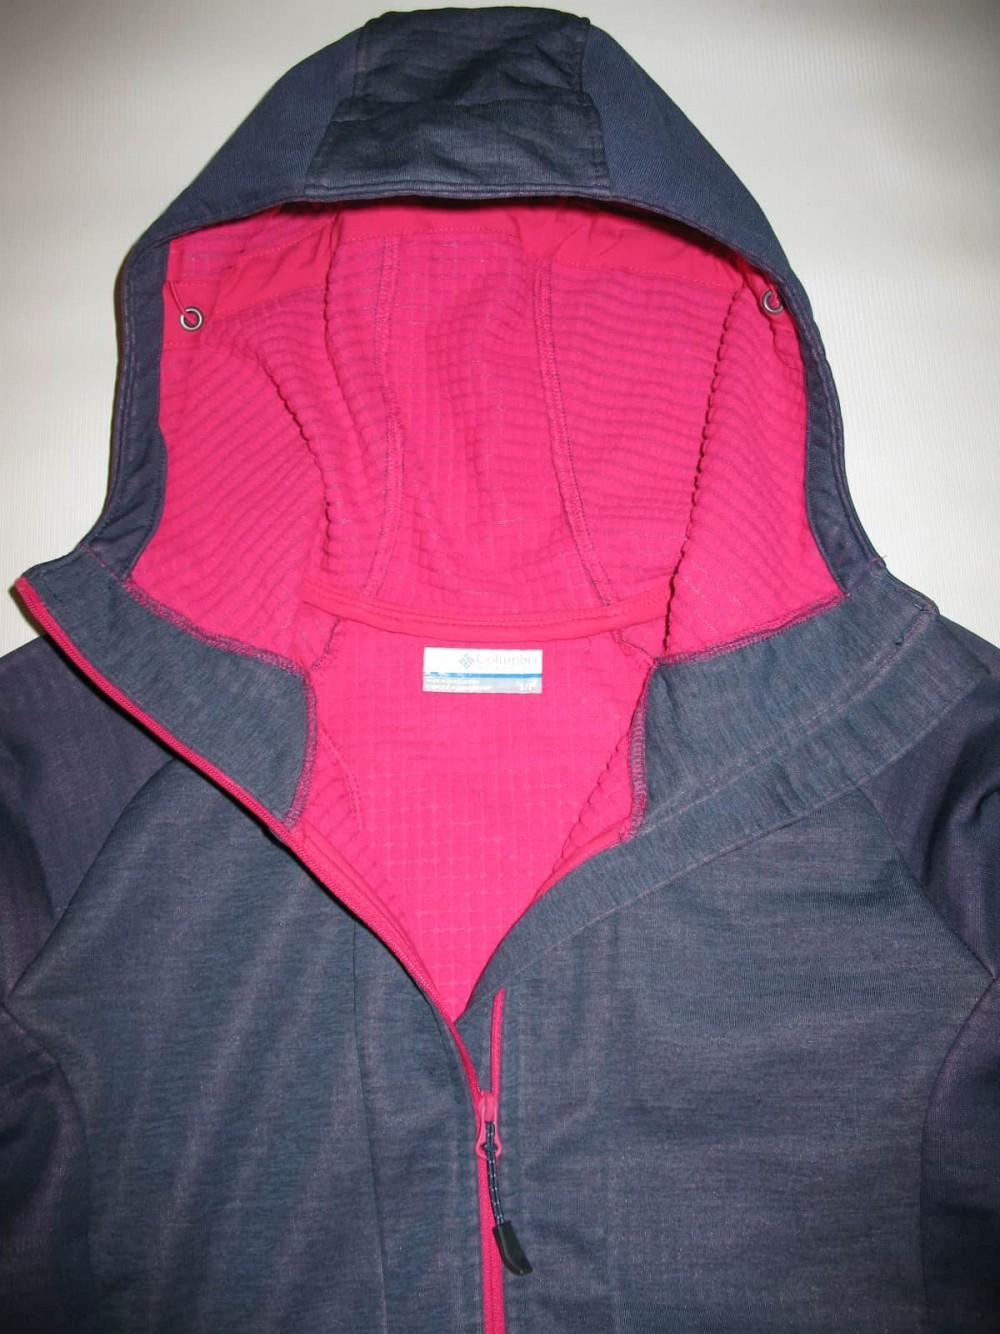 Куртка COLUMBIA steel cliff hooded softshell jacket lady (размер S) - 6